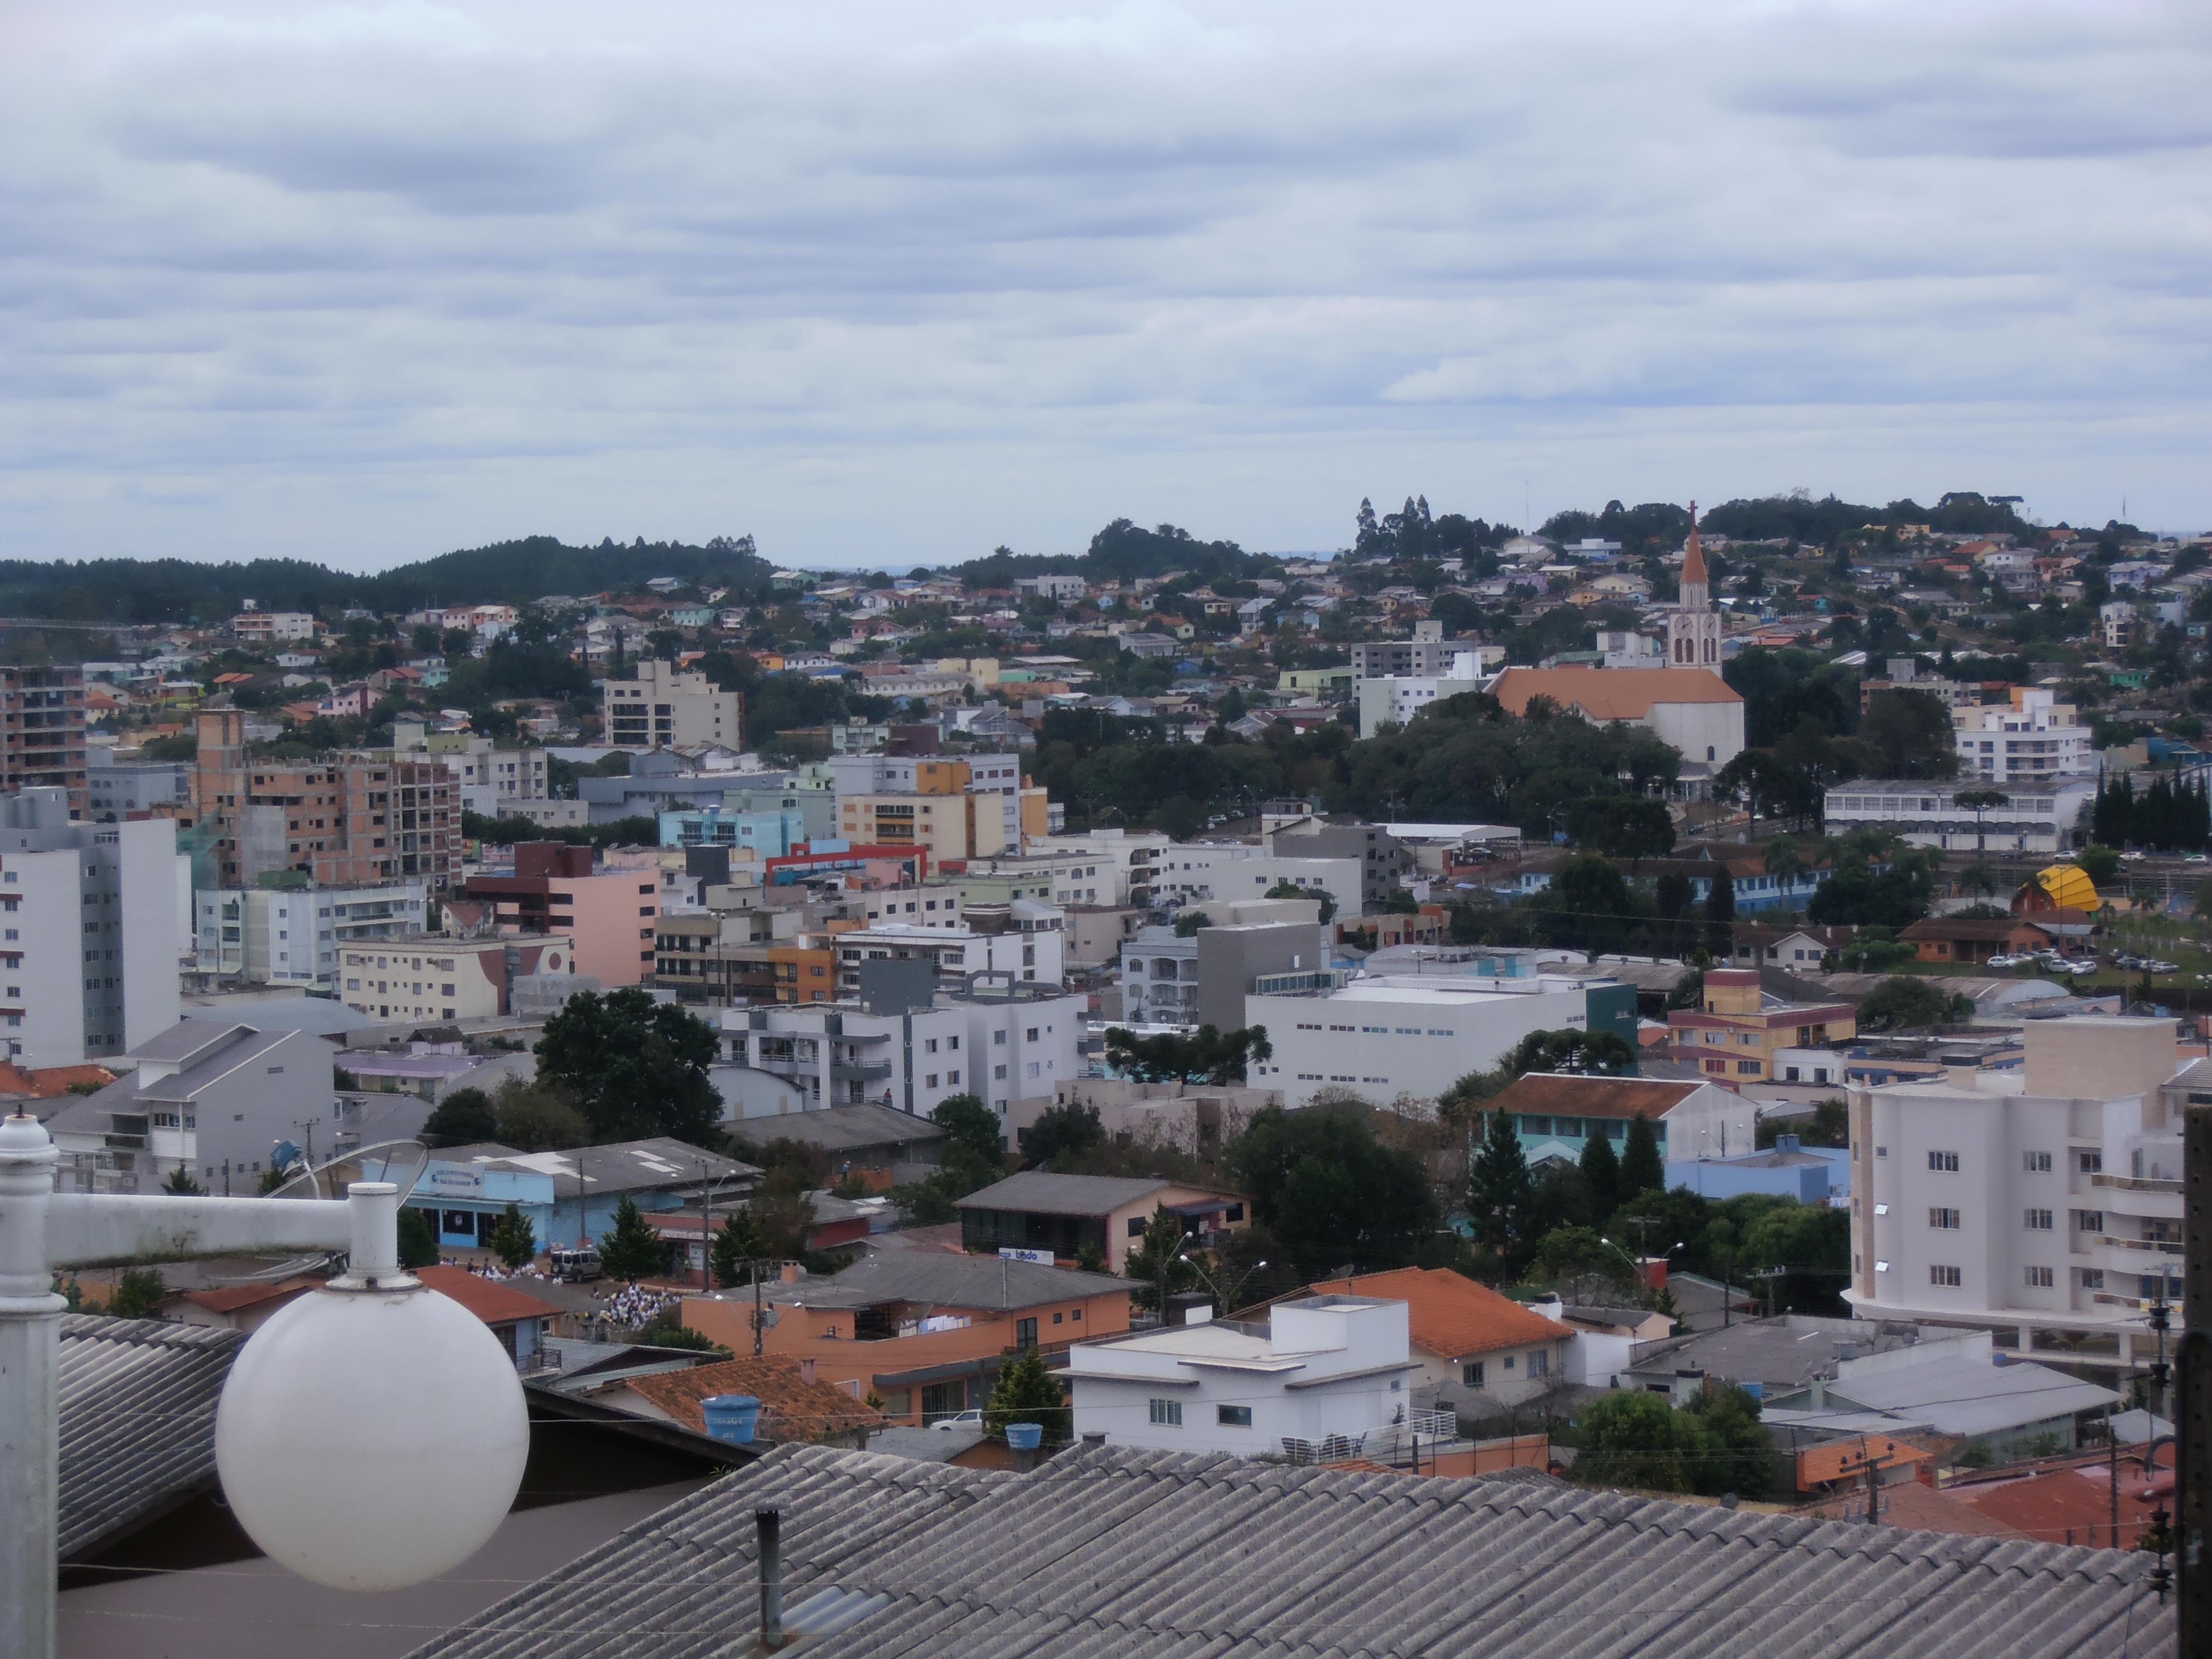 São Lourenço do Oeste Santa Catarina fonte: upload.wikimedia.org